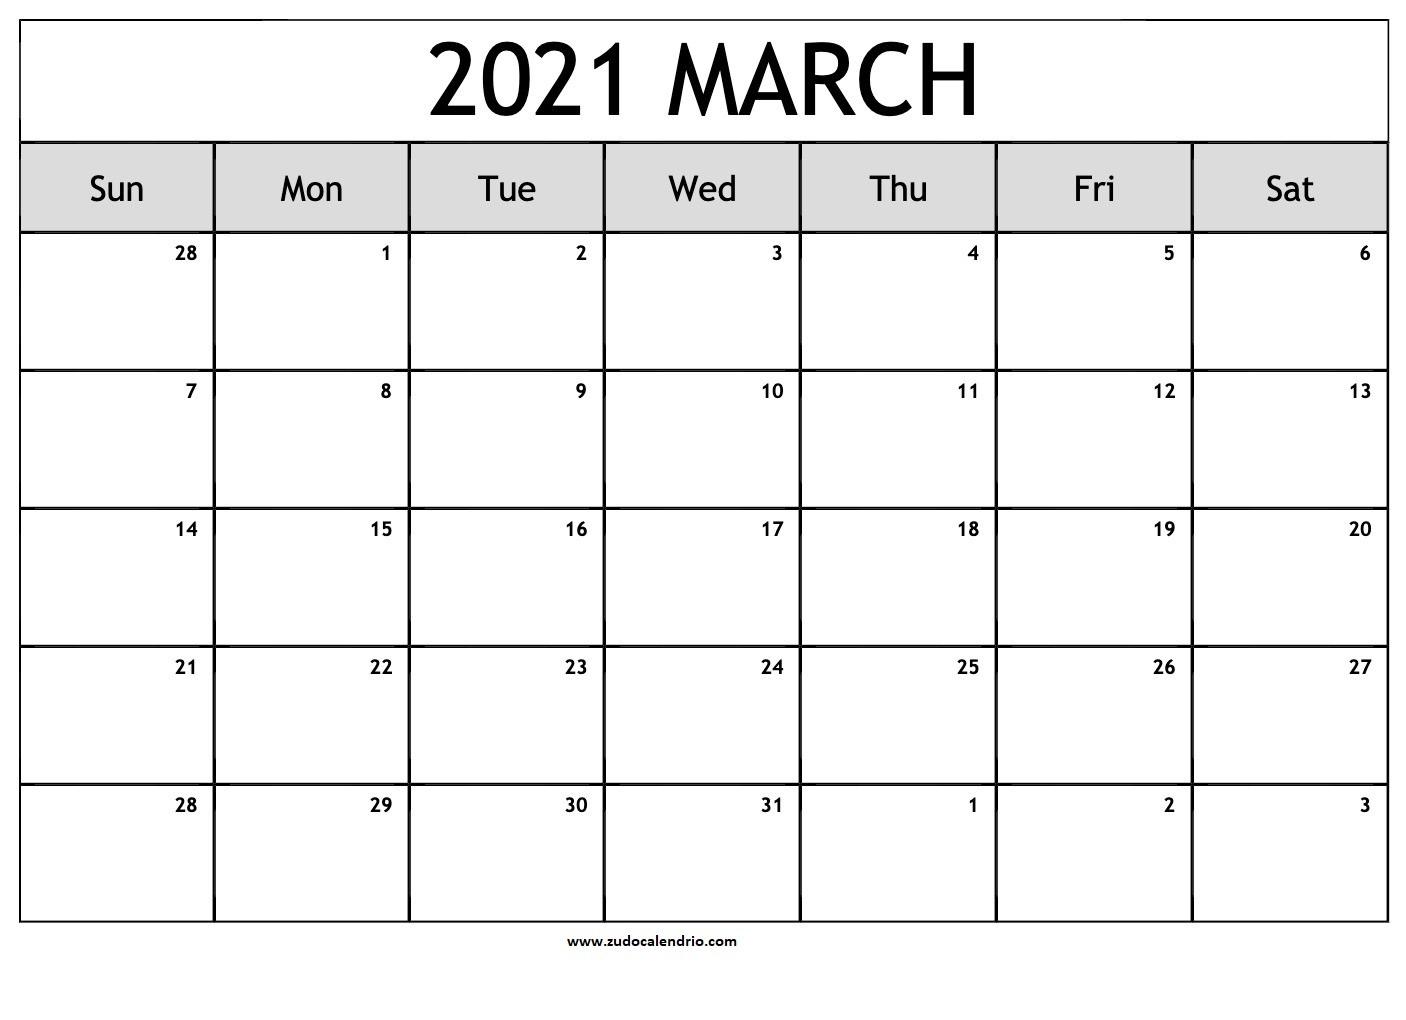 Blank March 2021 Calendar Pdf   Zudocalendrio-2021 Calendar Printable Free Pdf March